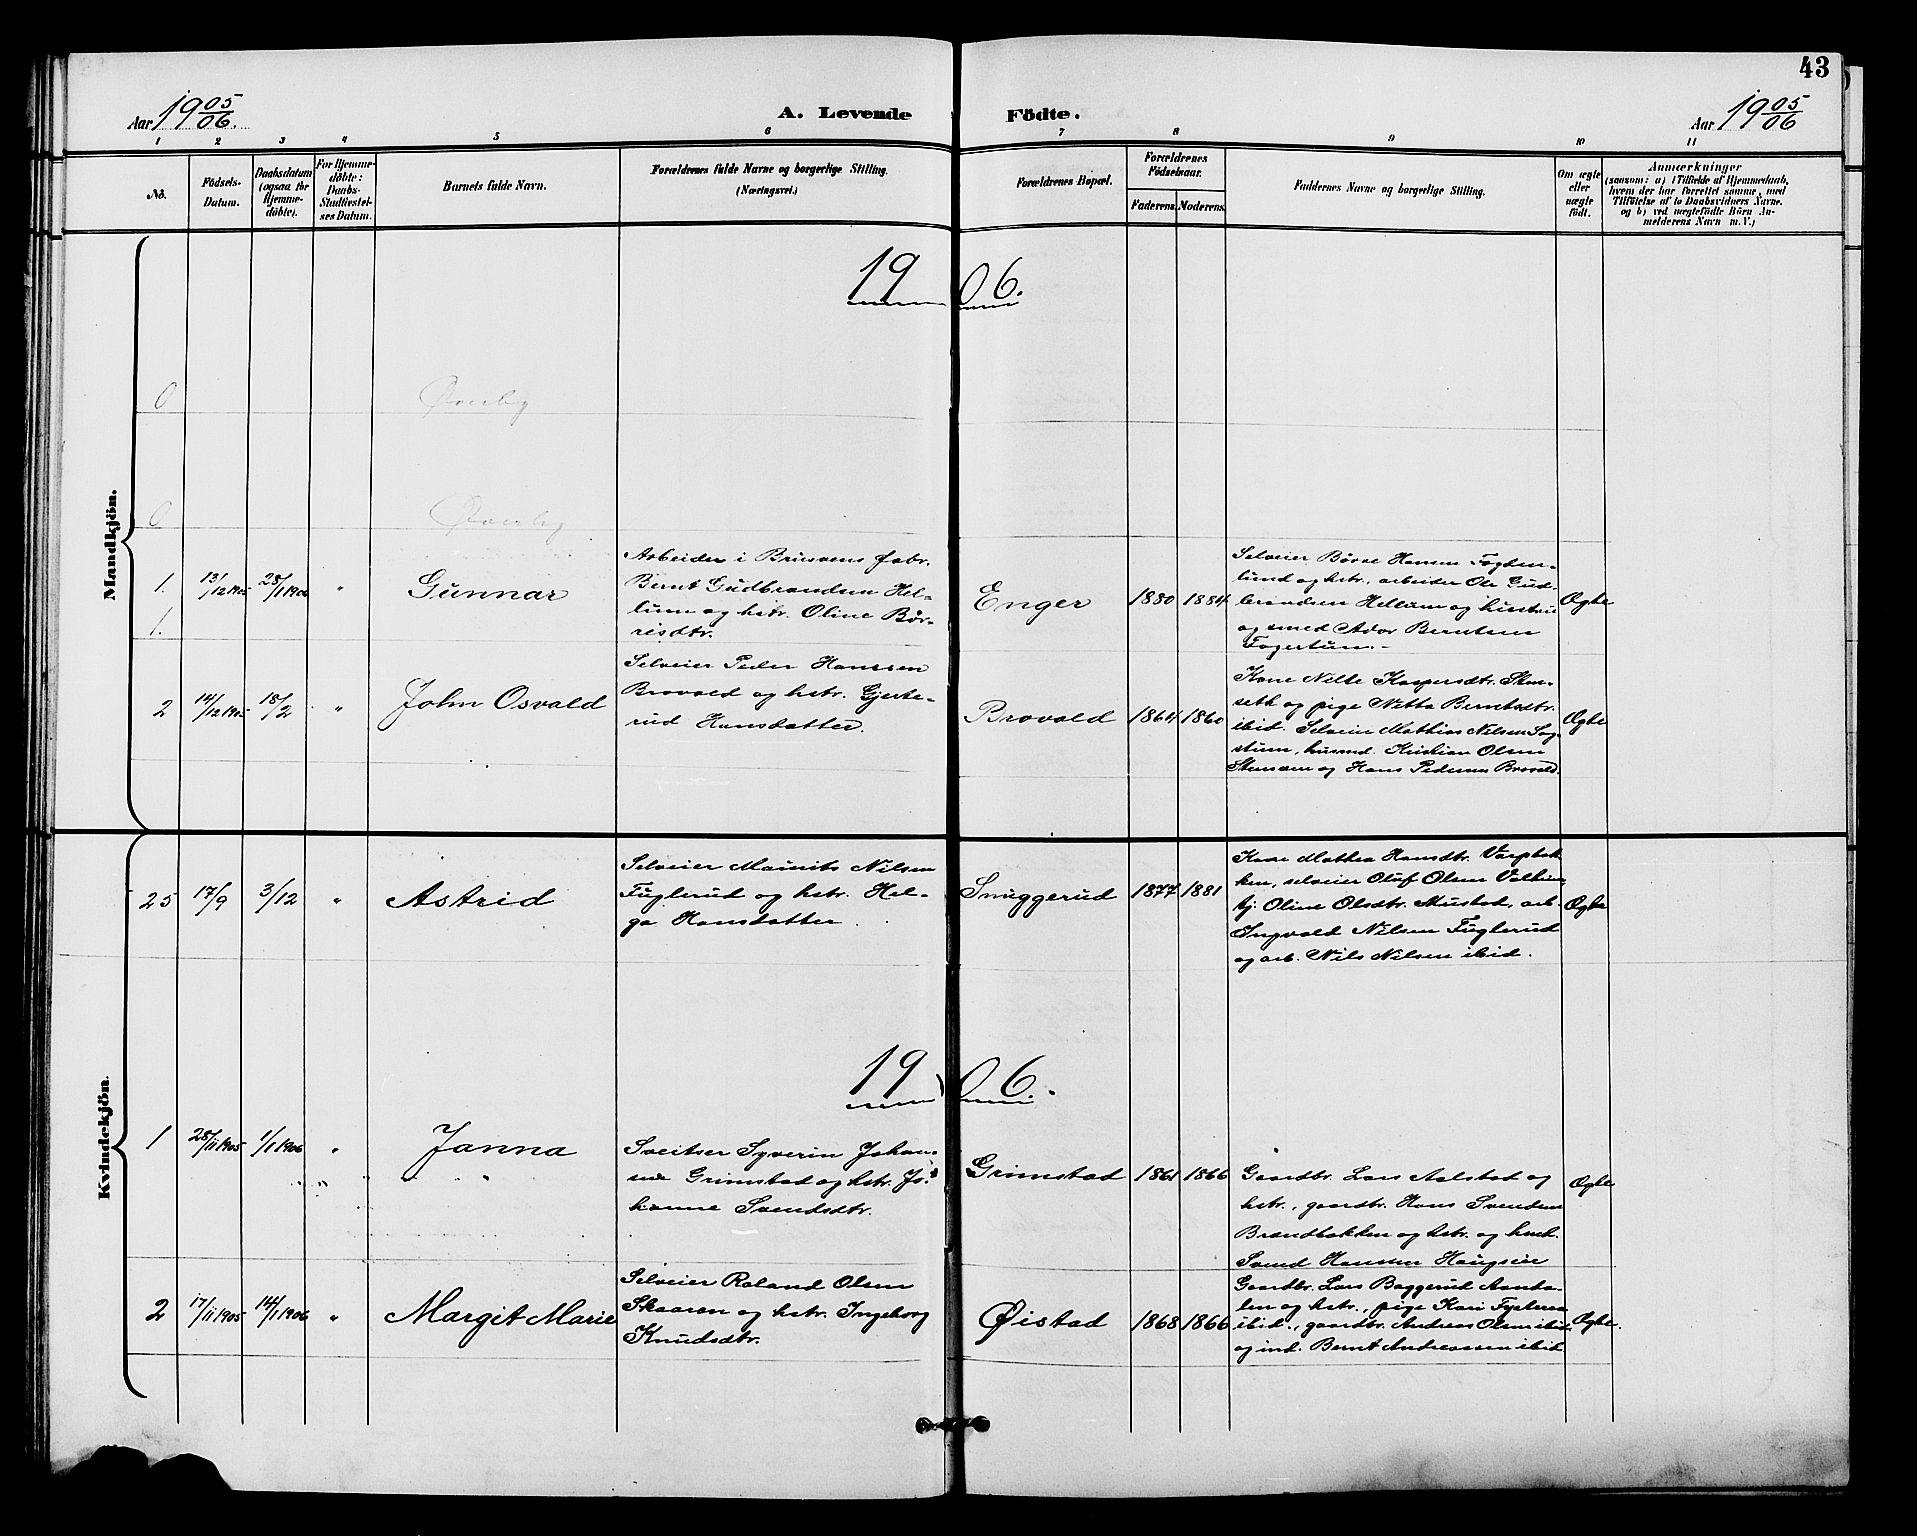 SAH, Vardal prestekontor, H/Ha/Hab/L0011: Klokkerbok nr. 11, 1899-1913, s. 43